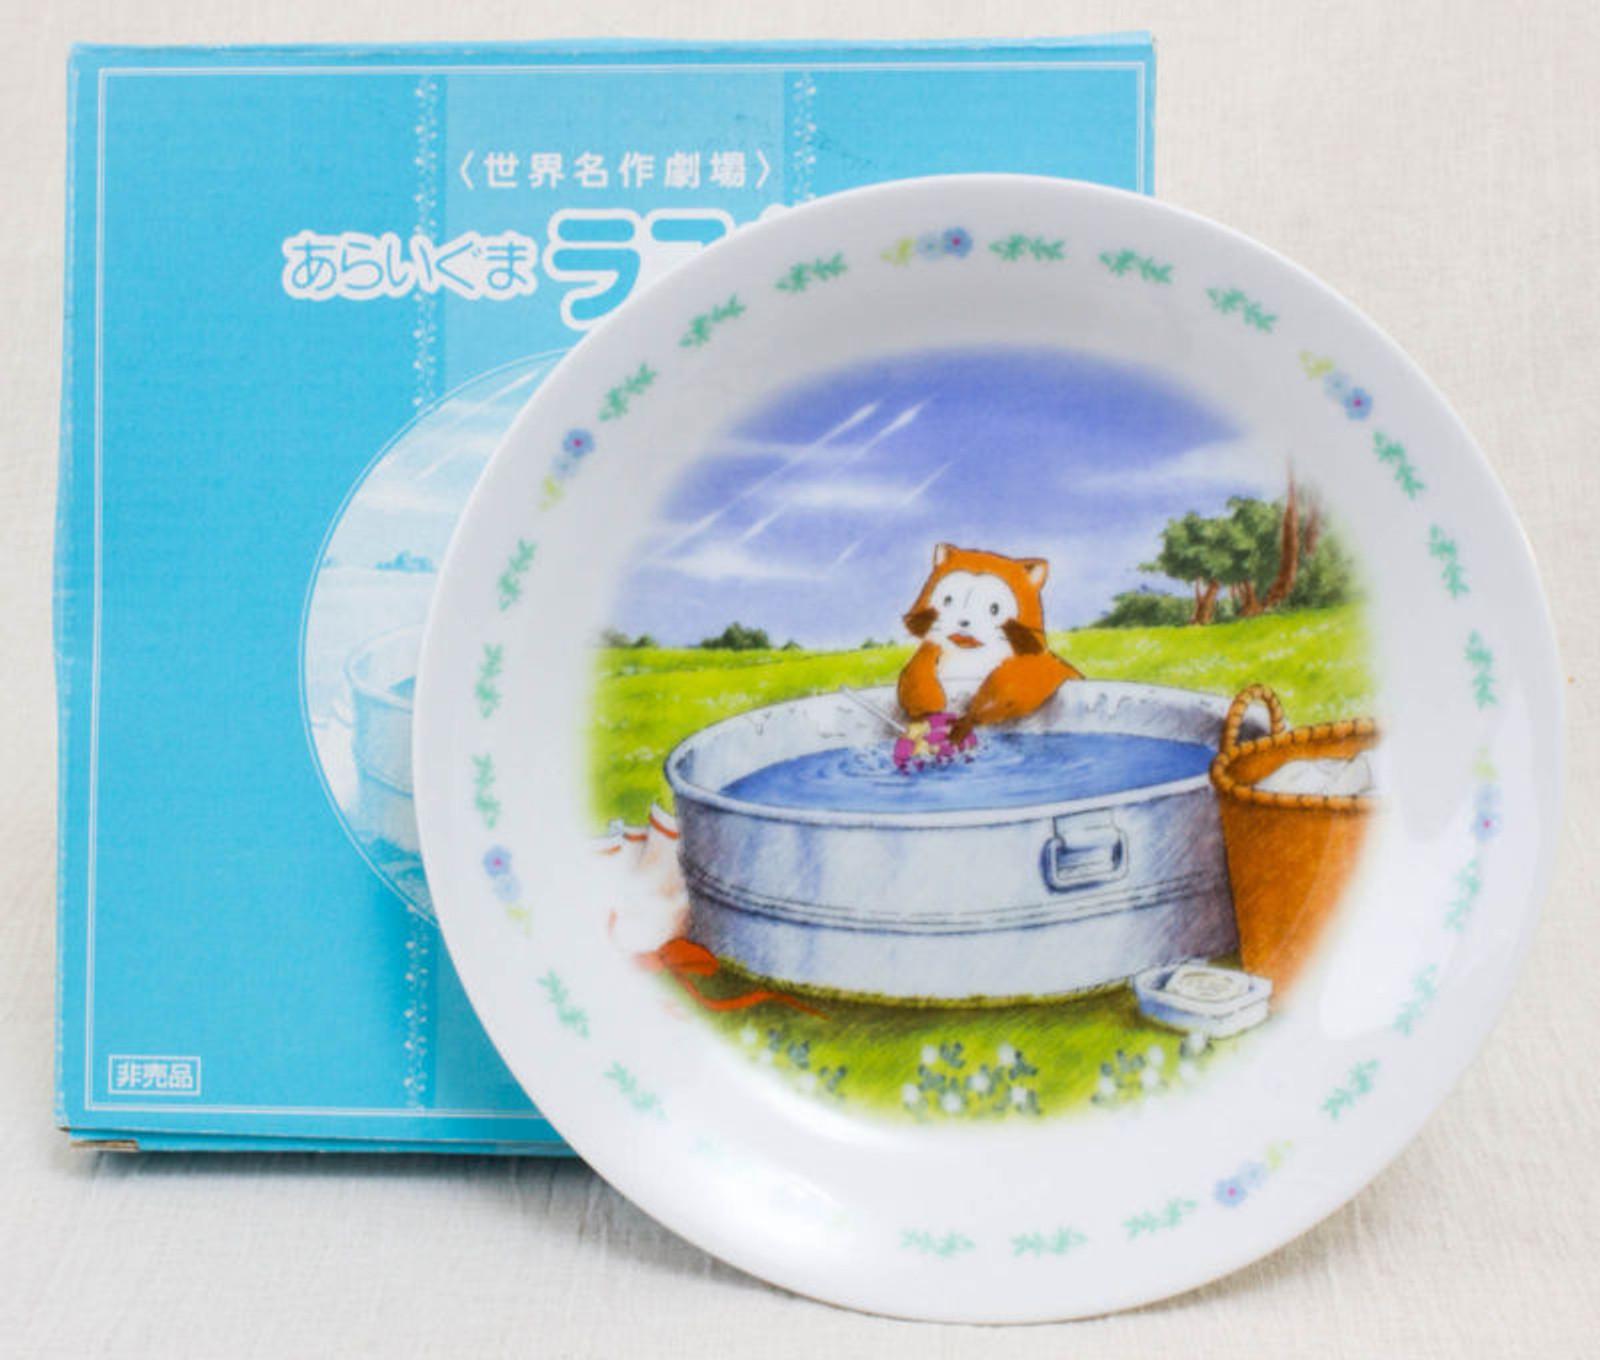 Rascal the Raccoon Picture Plate Dish Washing Ver. JAPAN ANIME MANGA